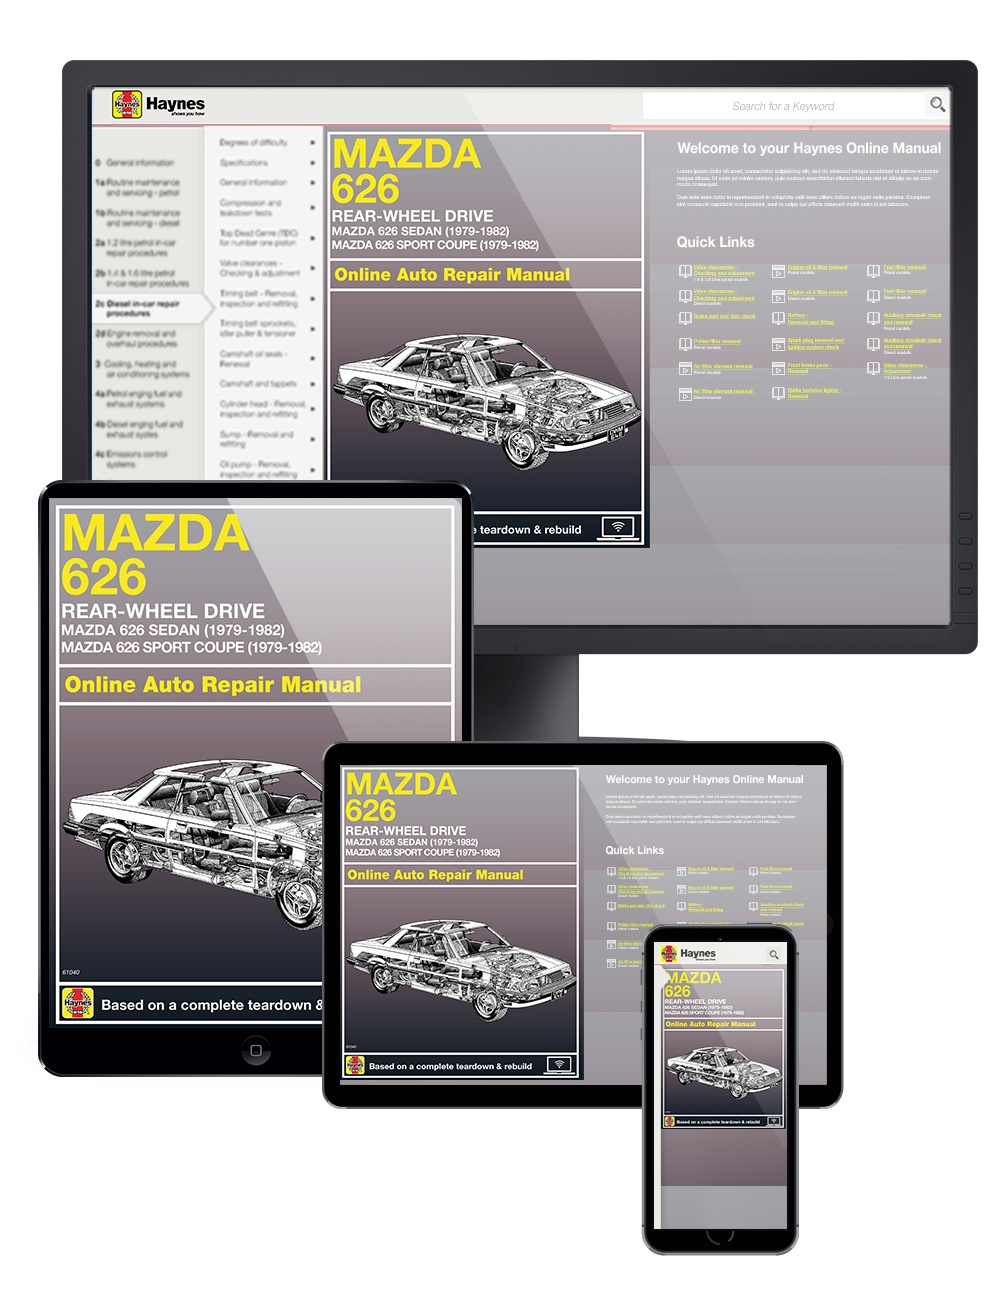 RWD Mazda 626 Sedan & Sport Coupe (79-82) Haynes Online Manual